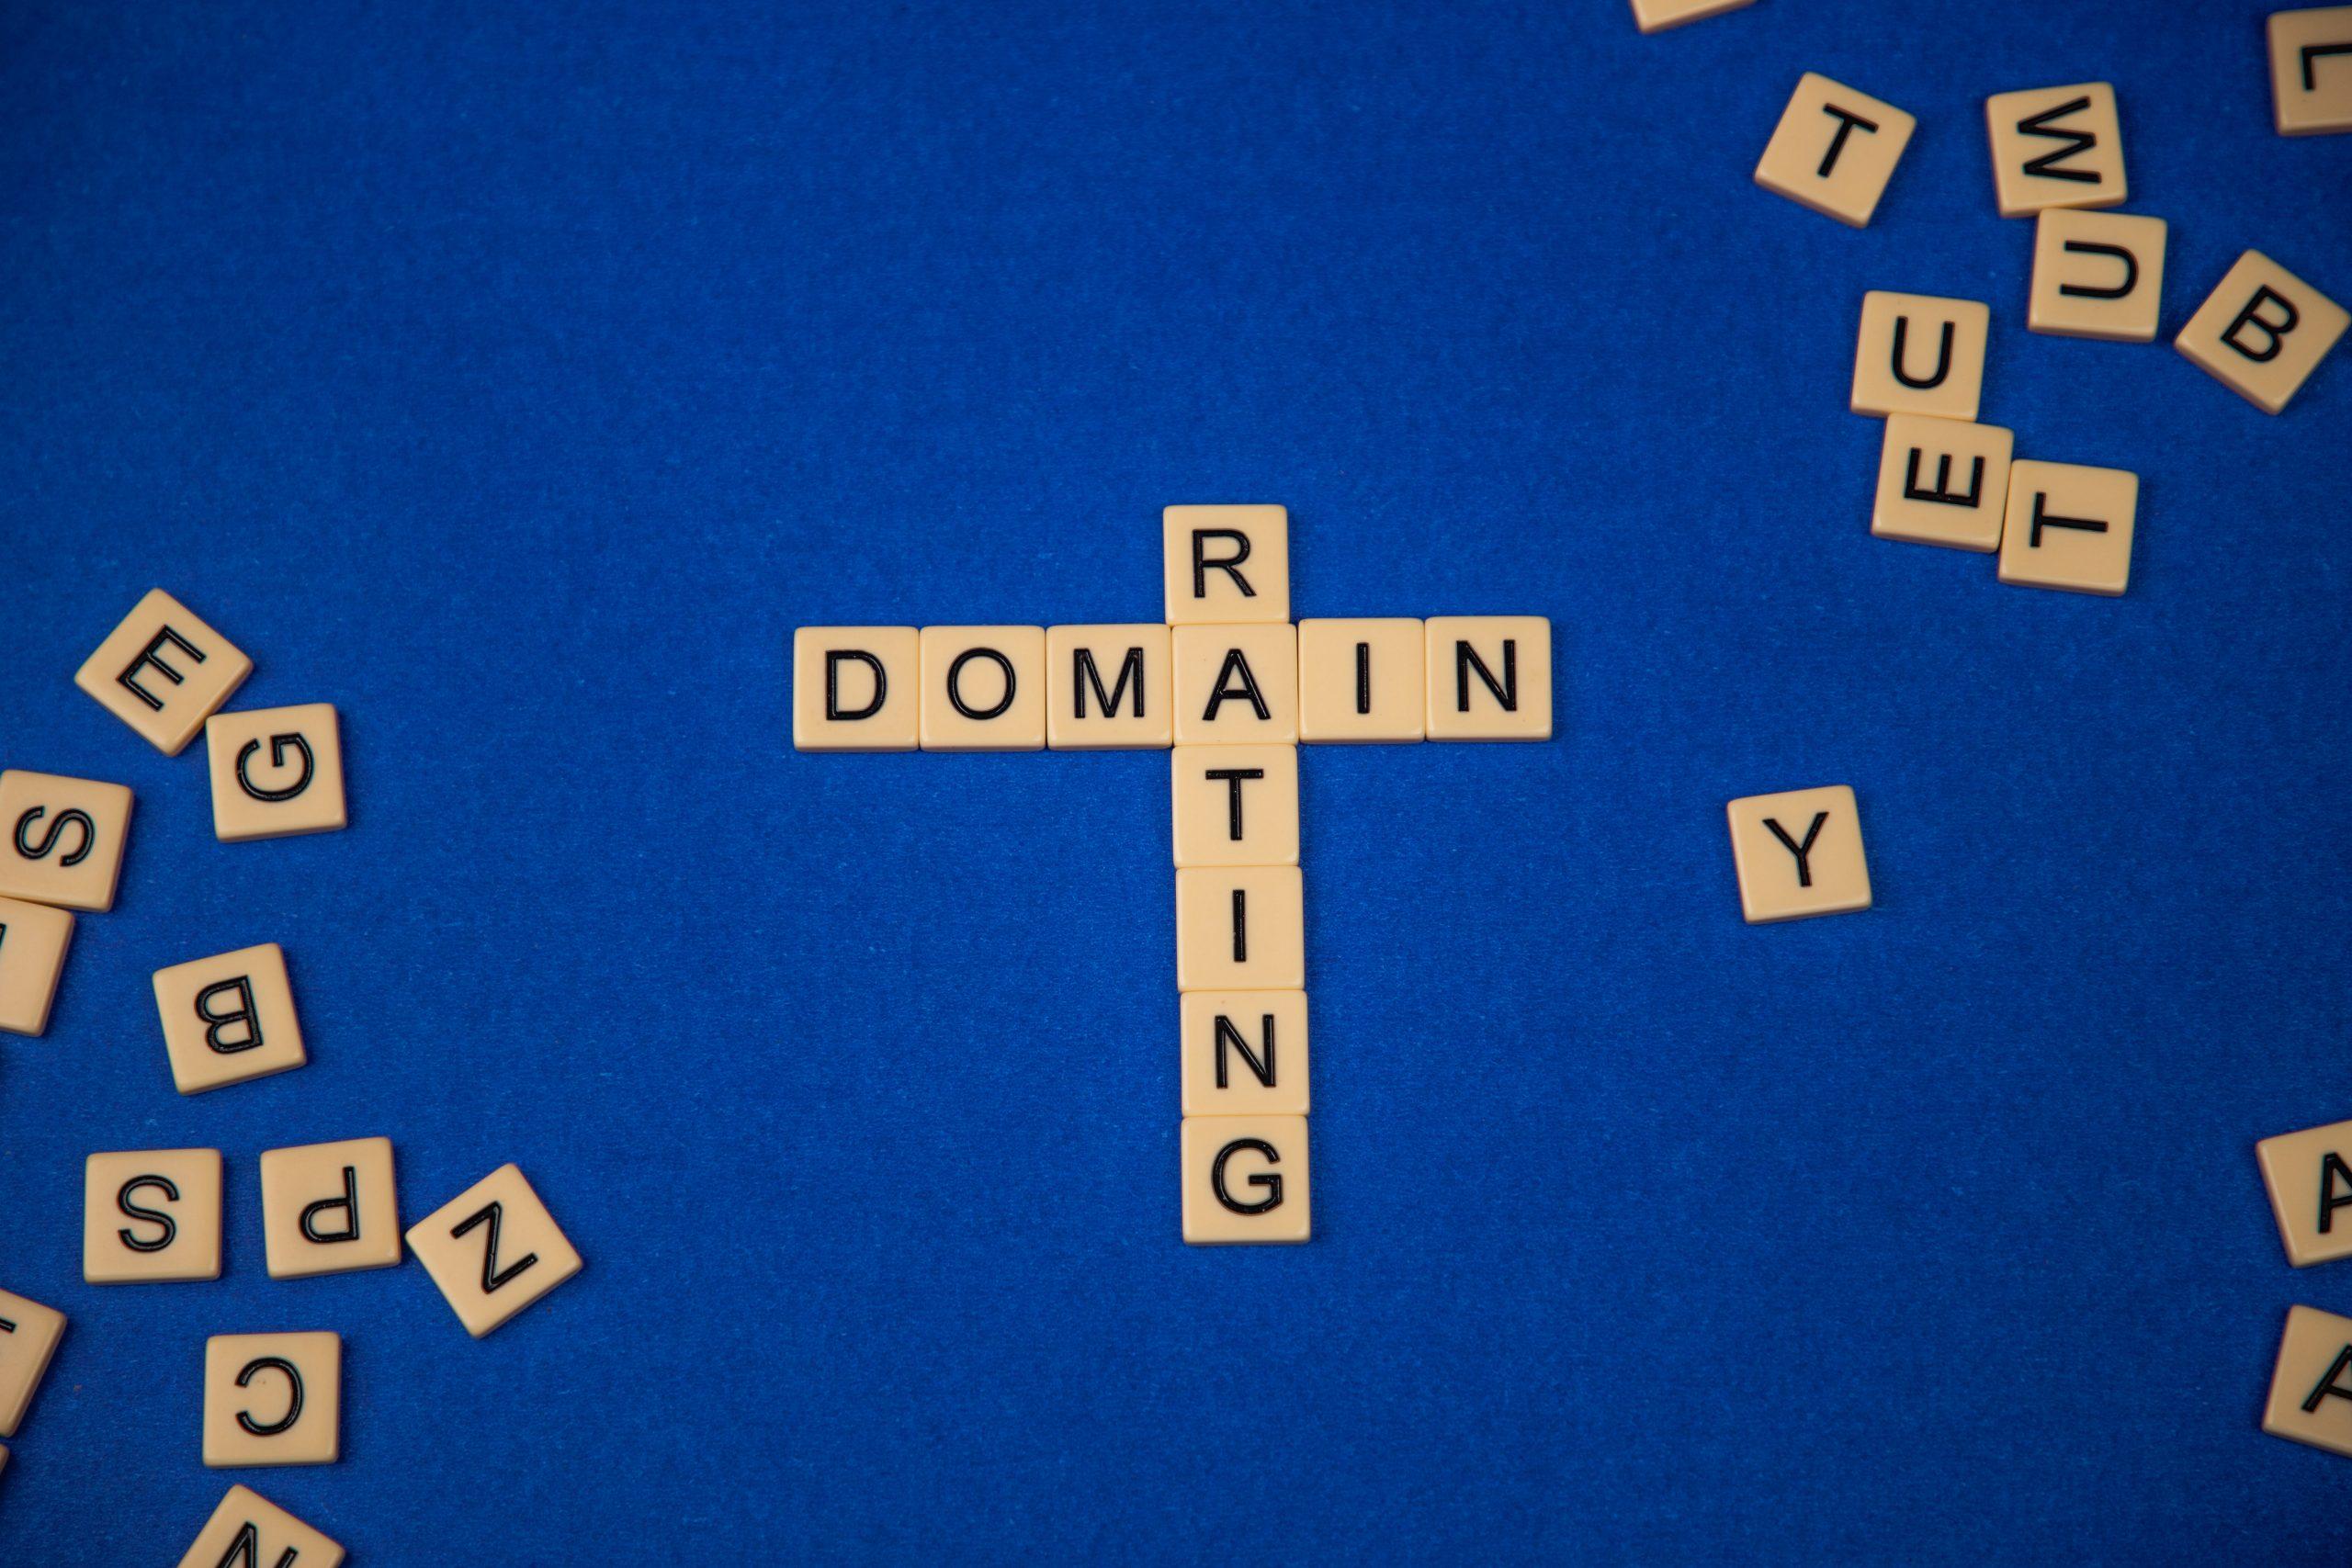 Domain rating written on scrabble